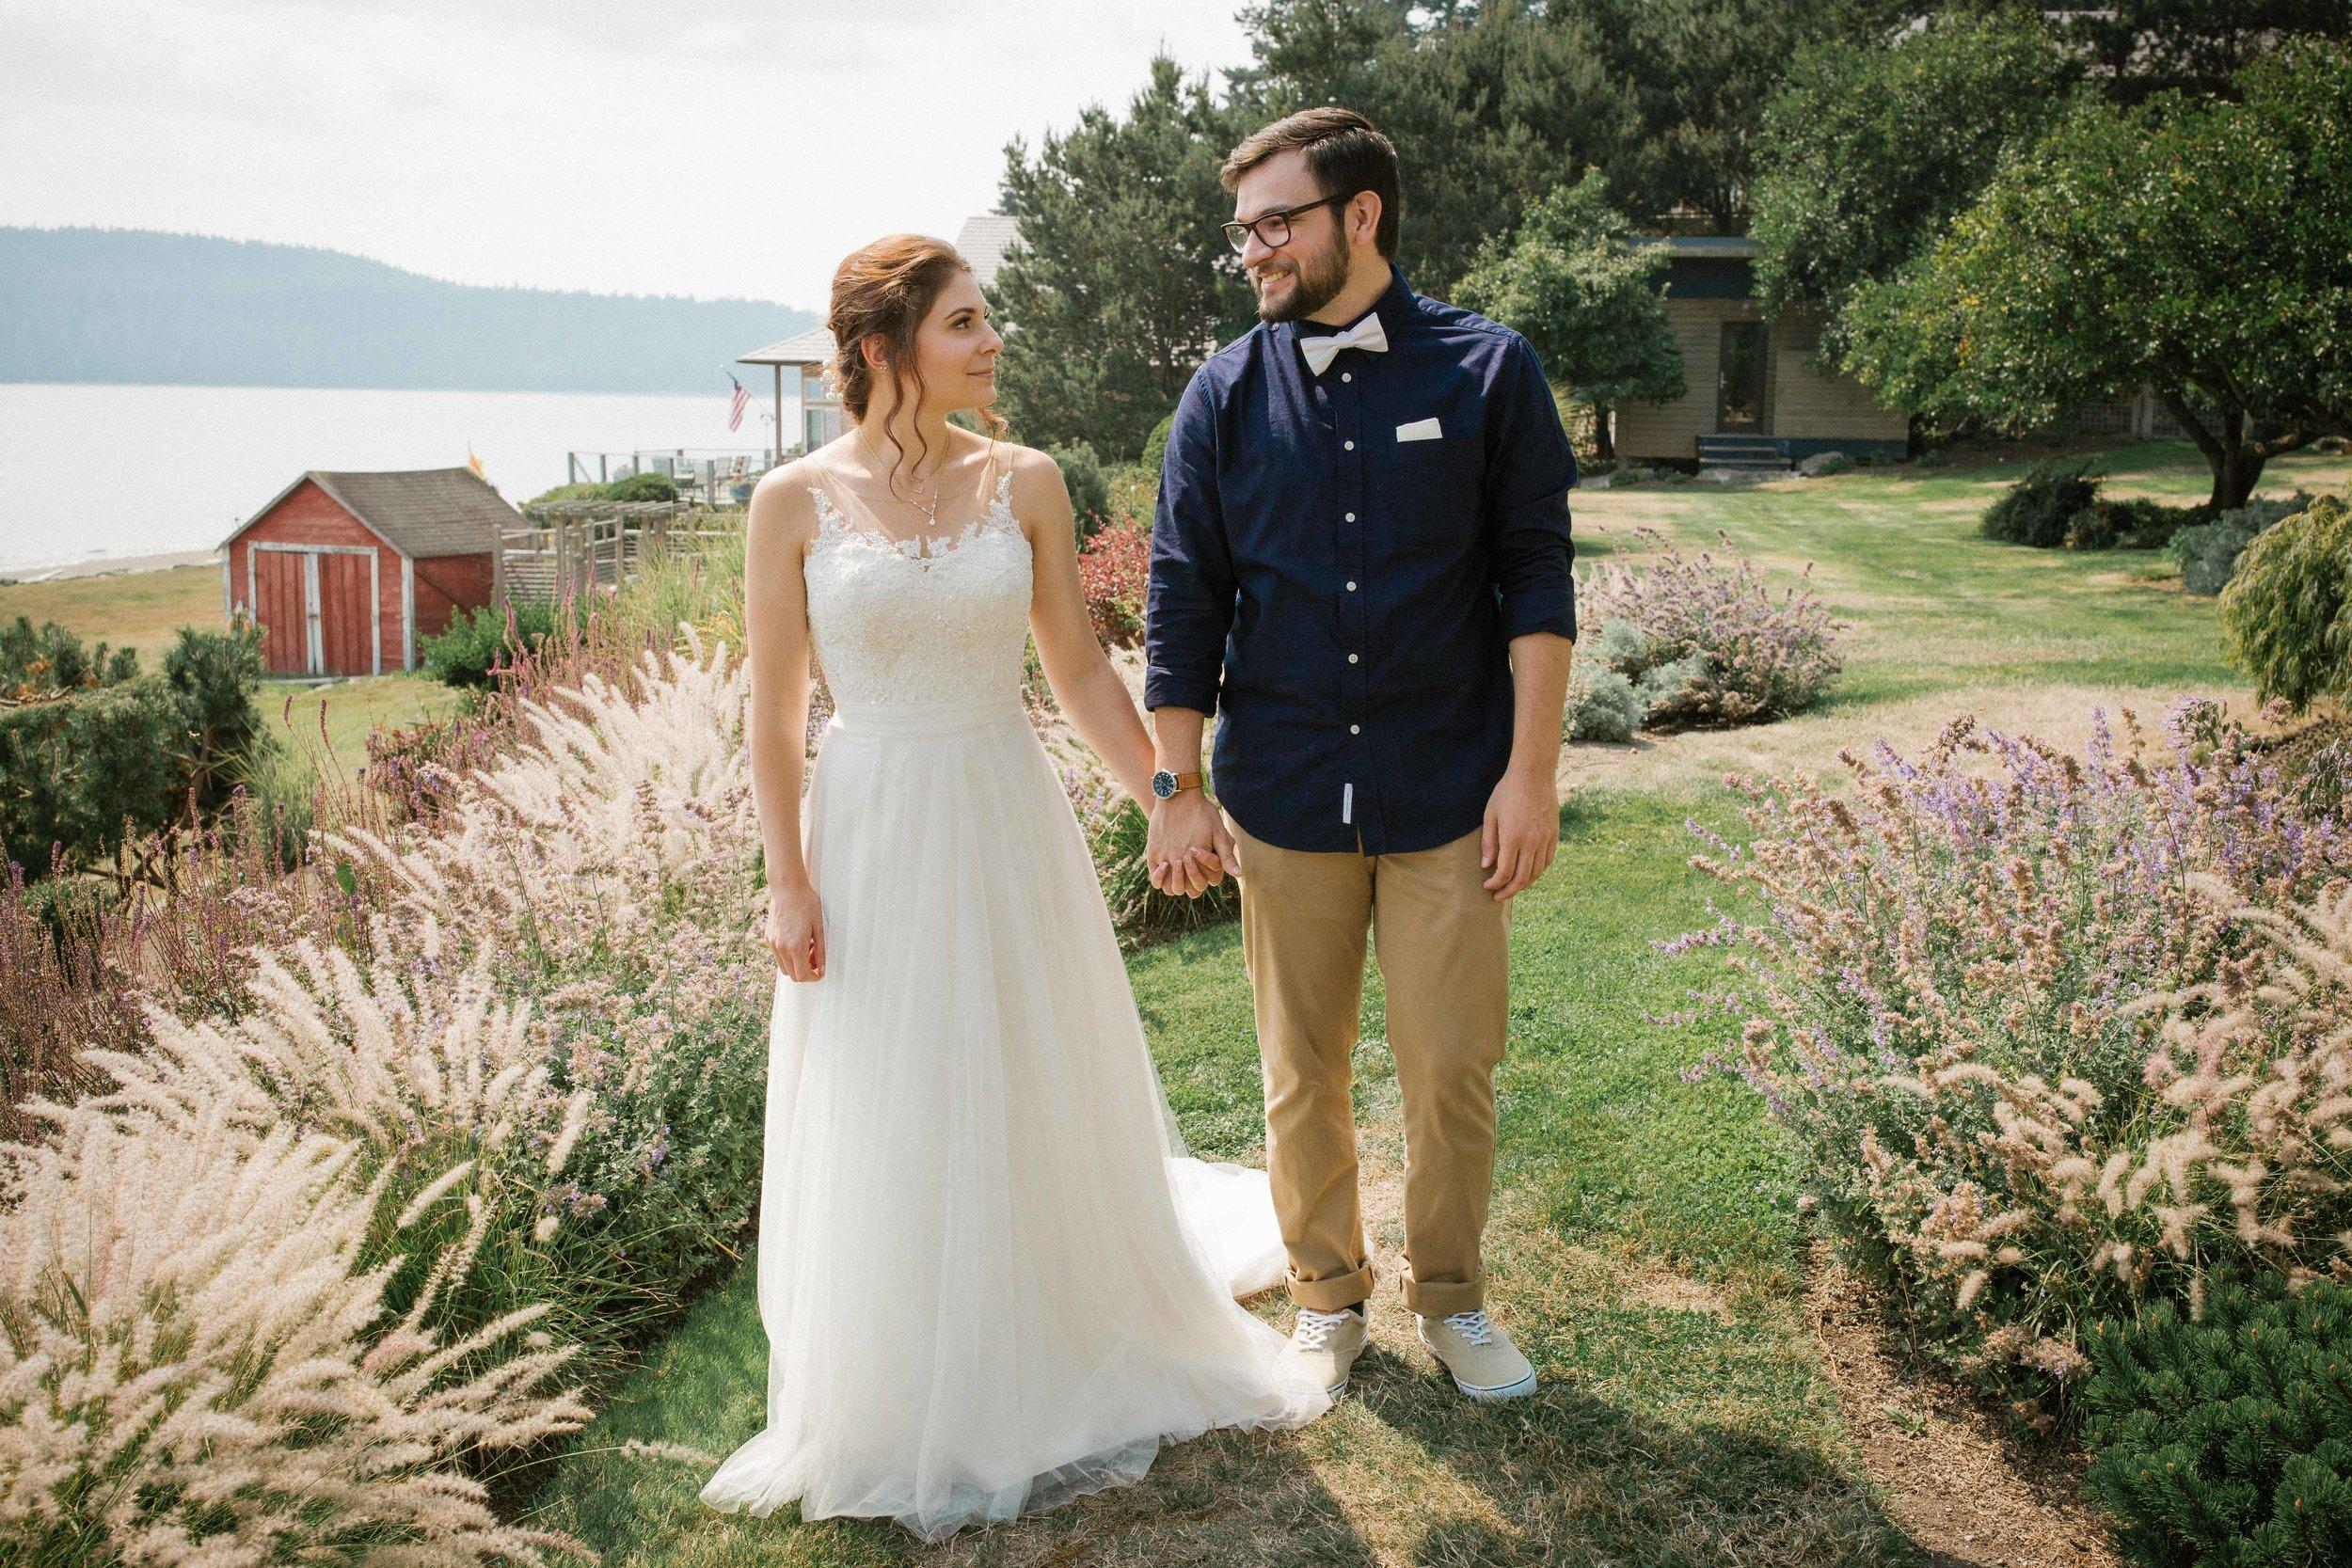 deception-pass-wedding-23.jpg